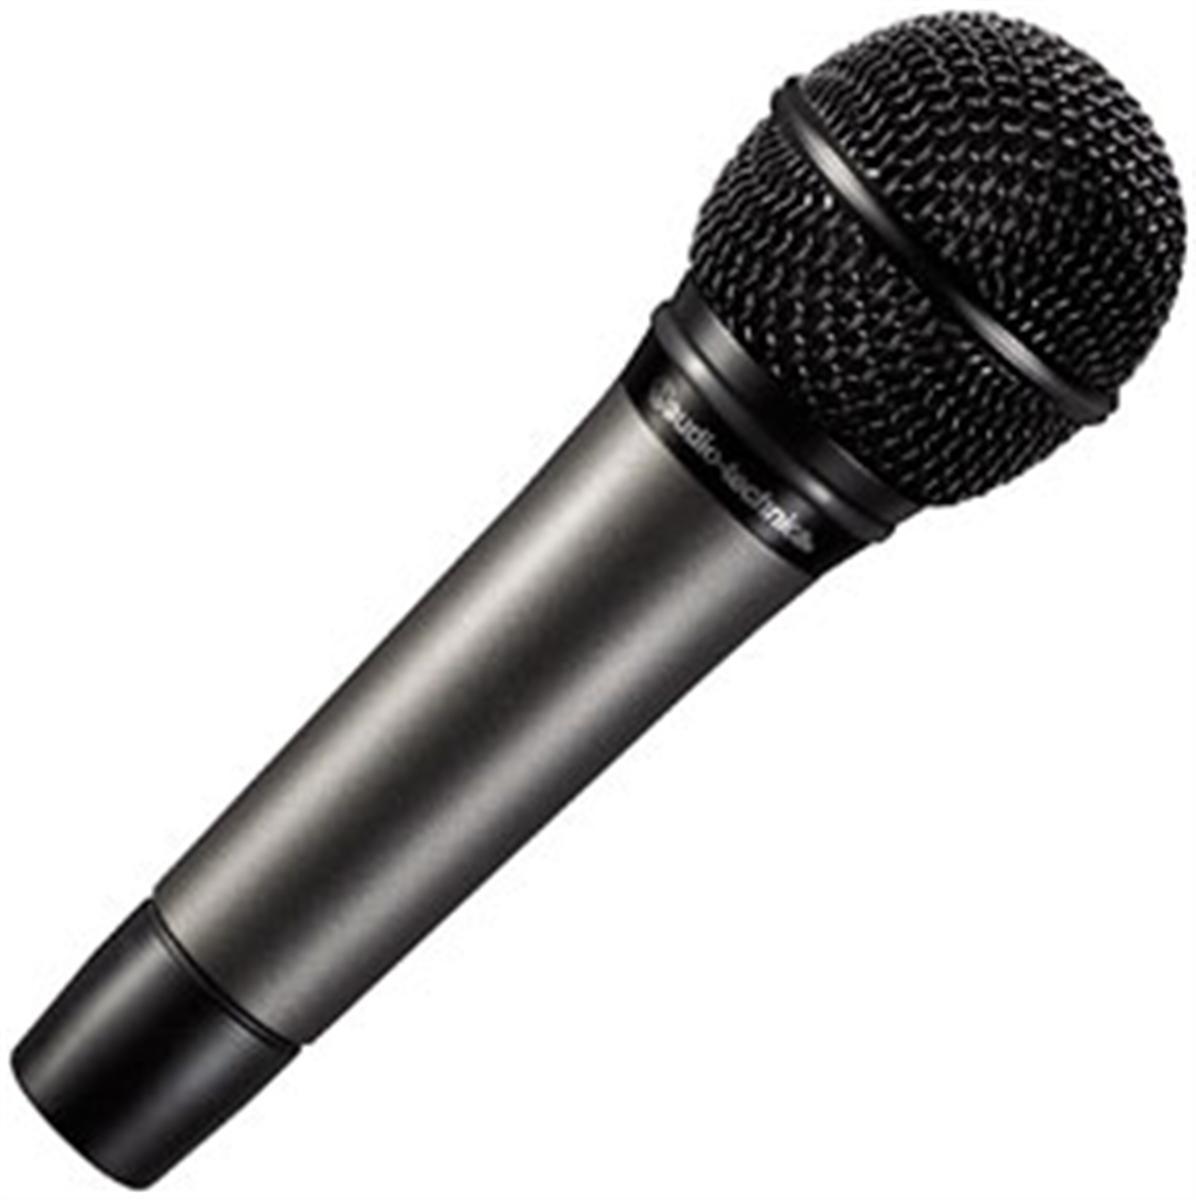 Microphone clipart. Clip art free panda